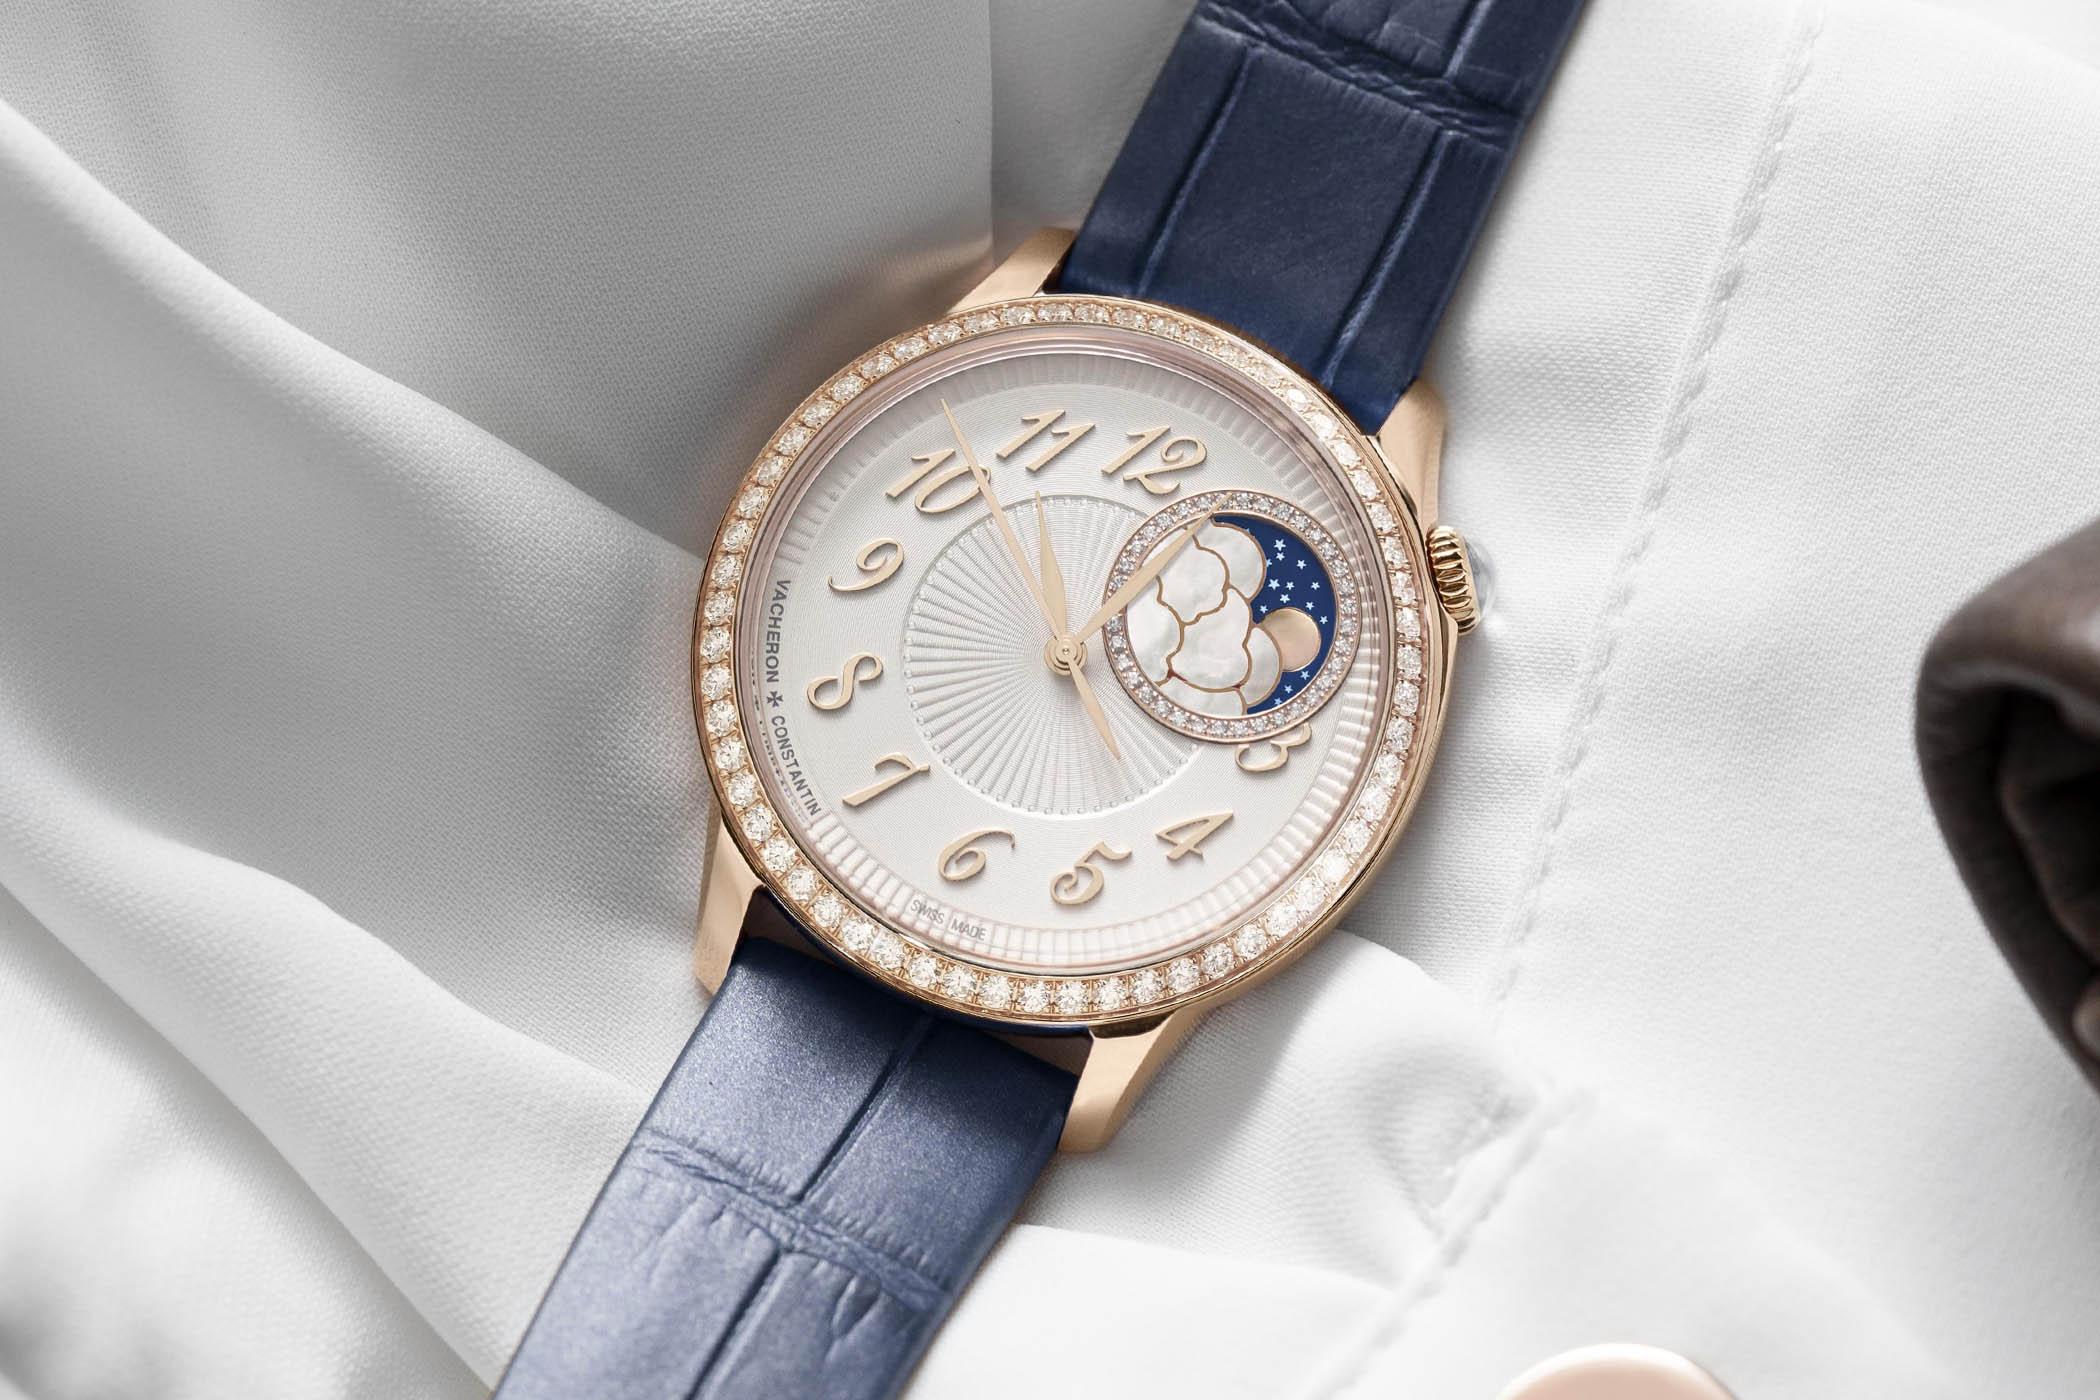 Vacheron Constantin Egerie collection 2020 womens watch - 5